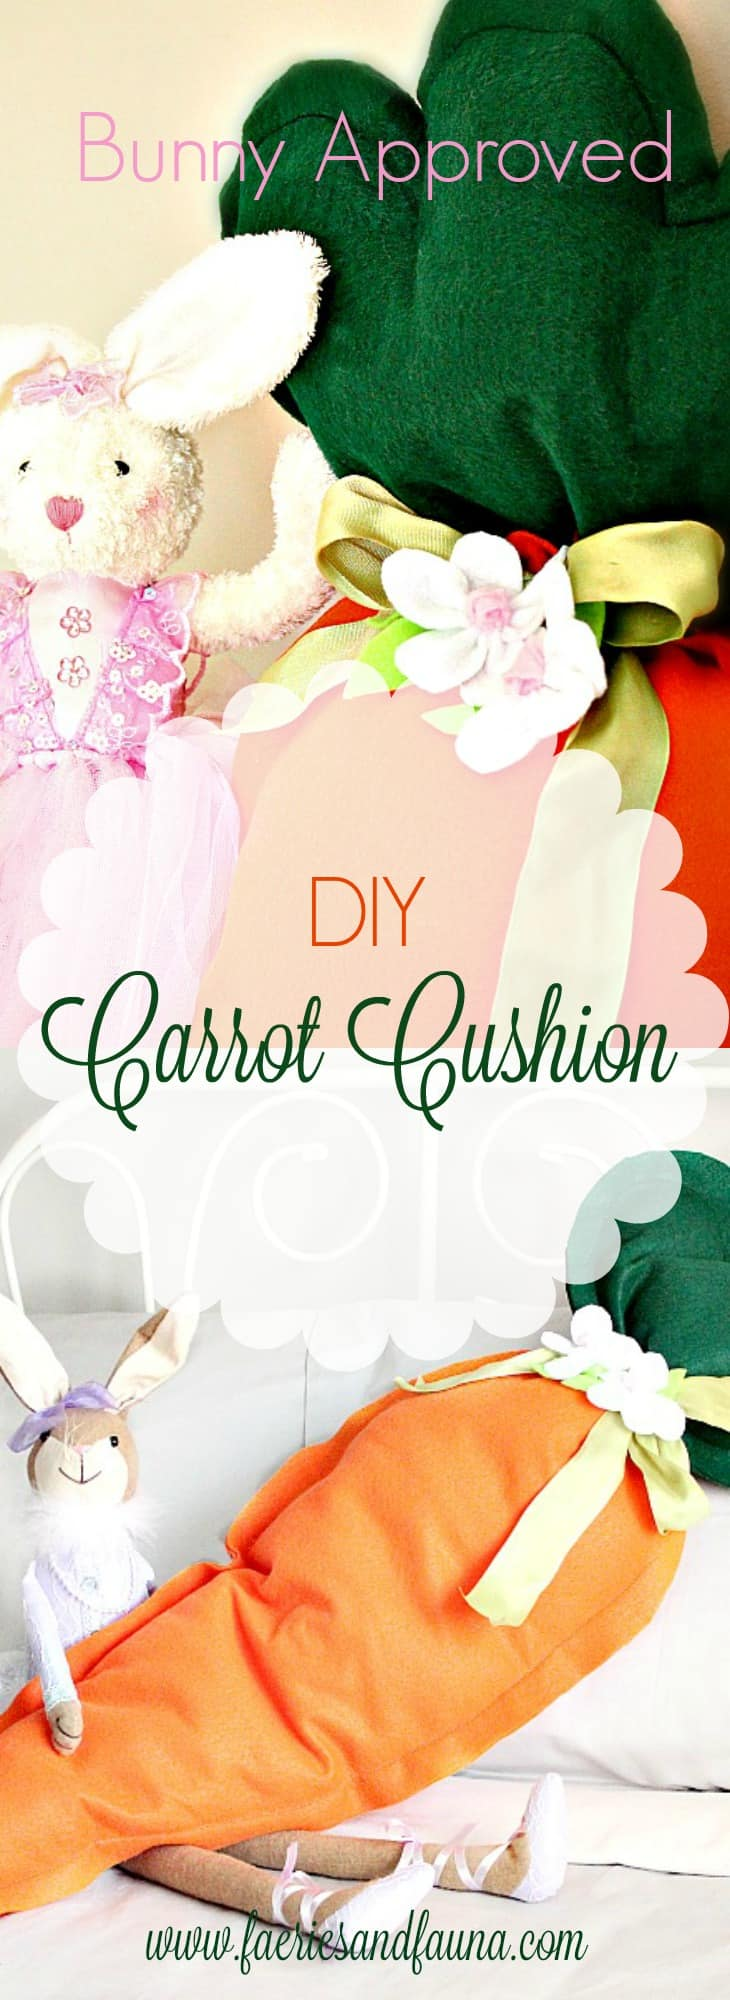 Easter sewing, Easter Decor, Diy Easter, Easter Crafts, easy Easter Crafts, Easter Candy Alternative, Easter Gift